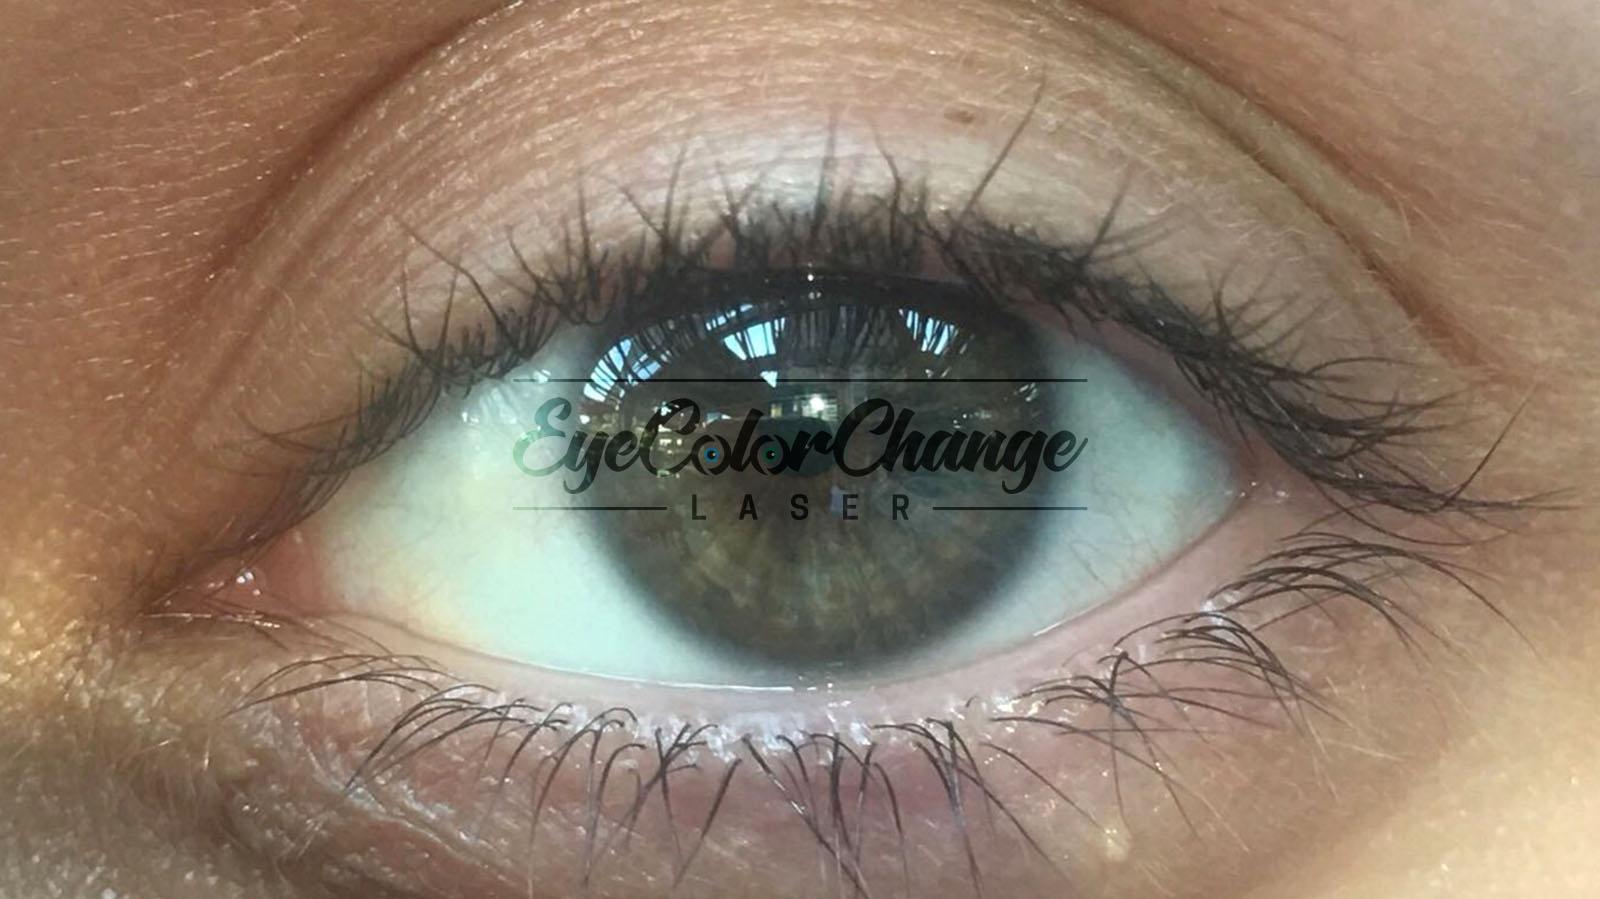 Eye color change with laser, eye color change surgery with laser, permanent eye color change with laser, eye color change laser turkey, eye color change laser price, eye color change laser experience, change eye color with laser before and after